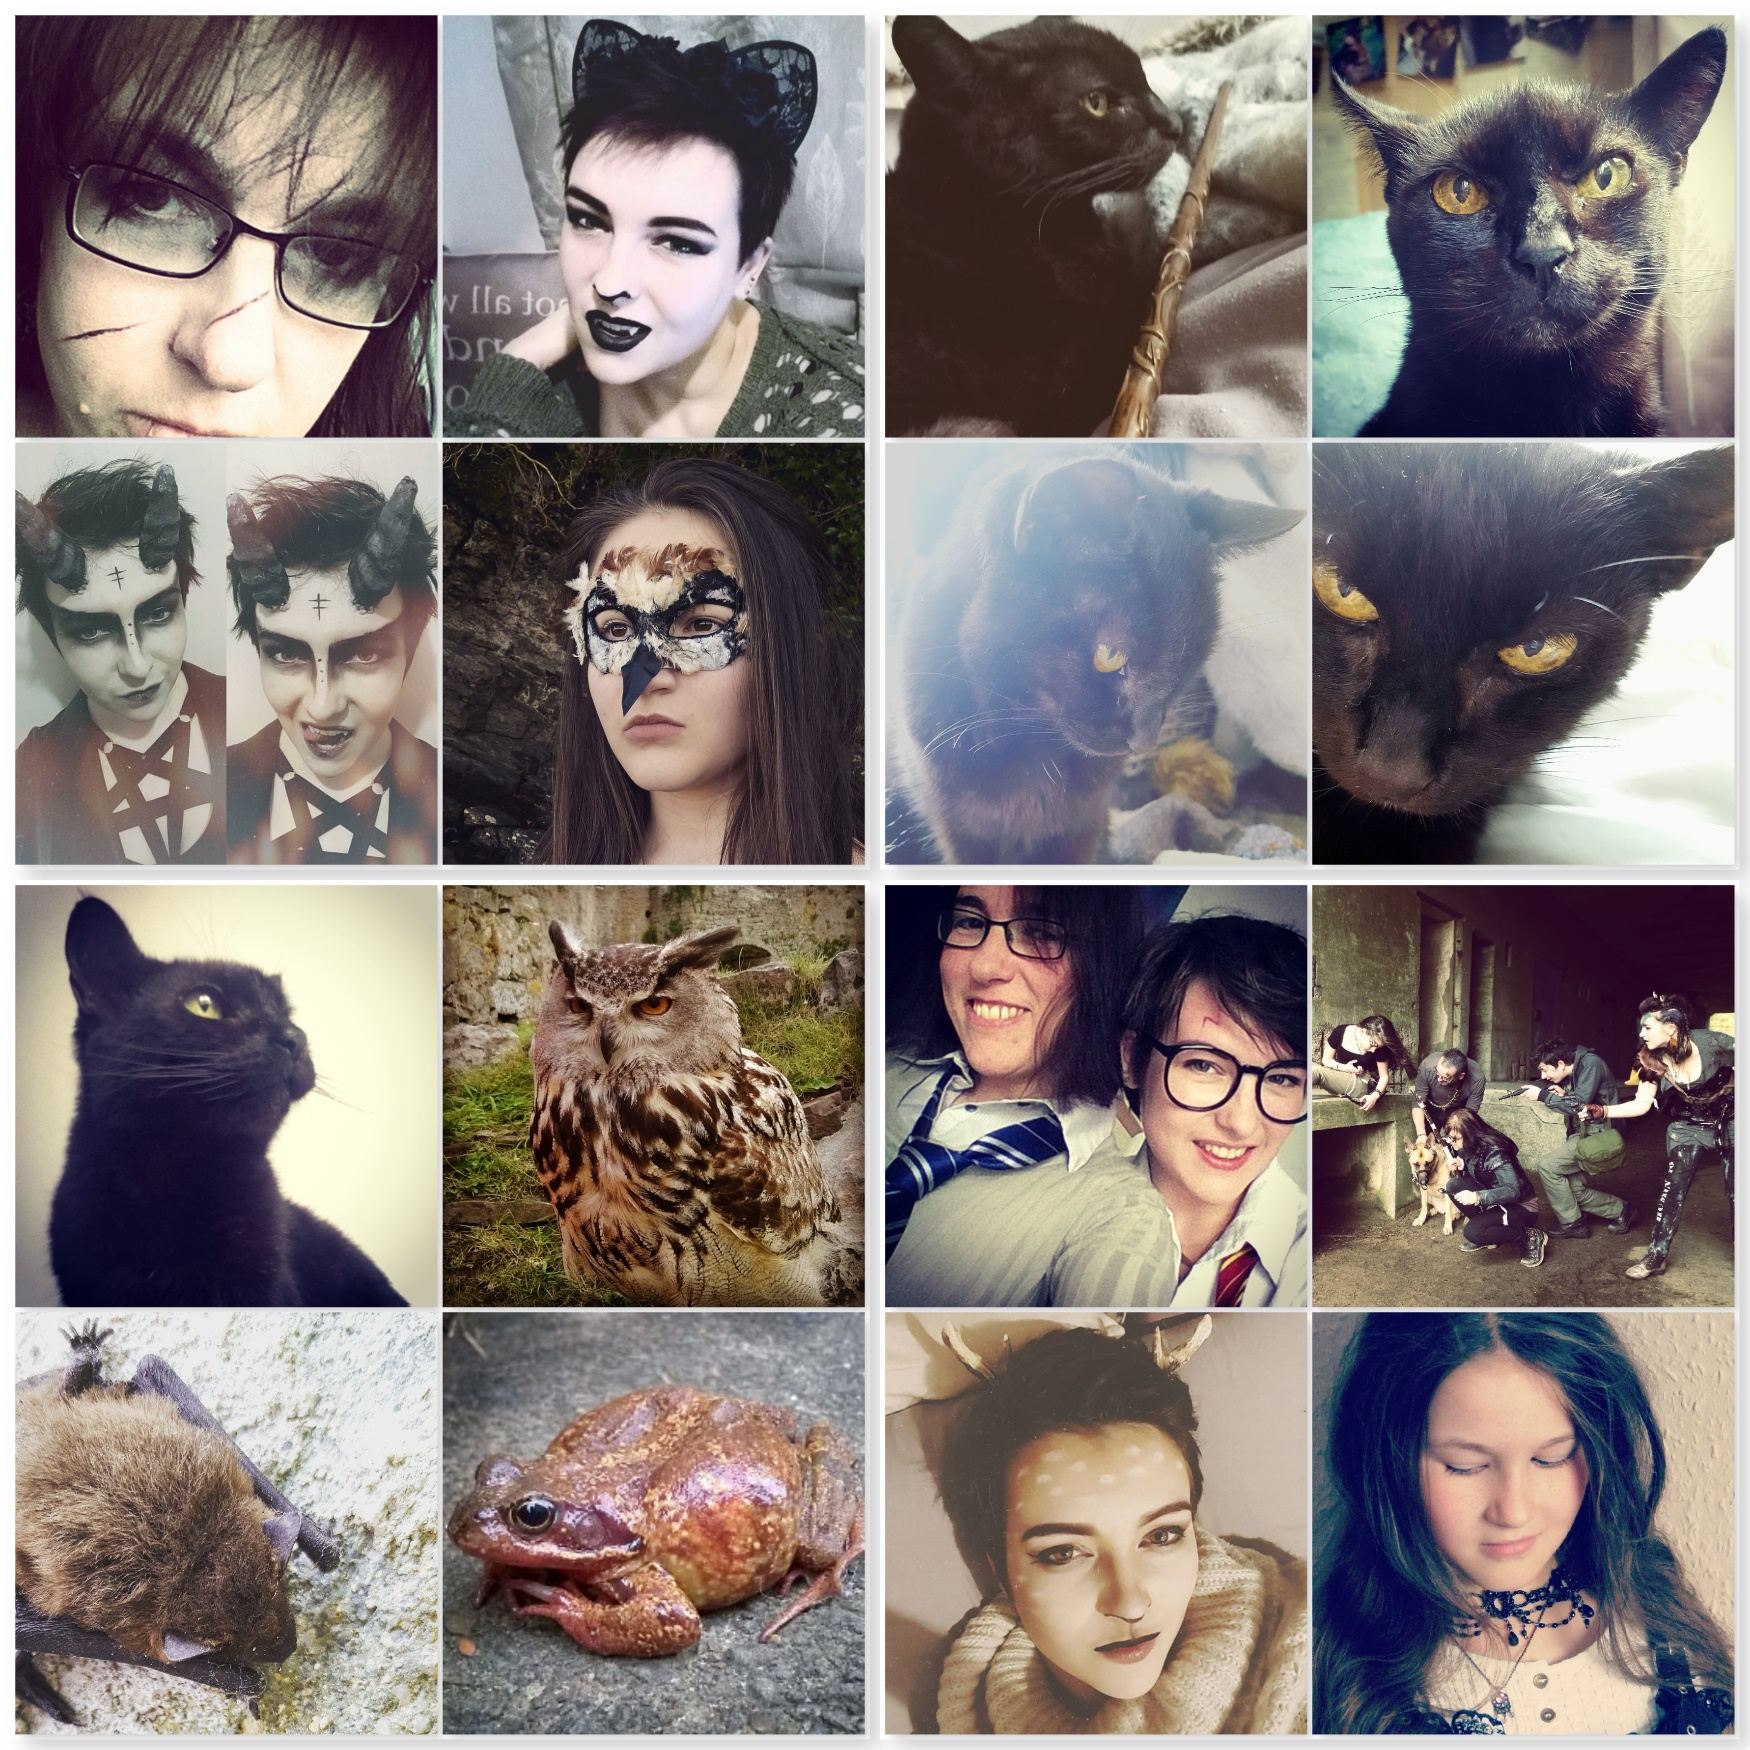 Halloween - Black Cats, Owl, Toad, Bats, Demon, Harry Potter - The Beast Bits of Halloween - The Last Krystallos